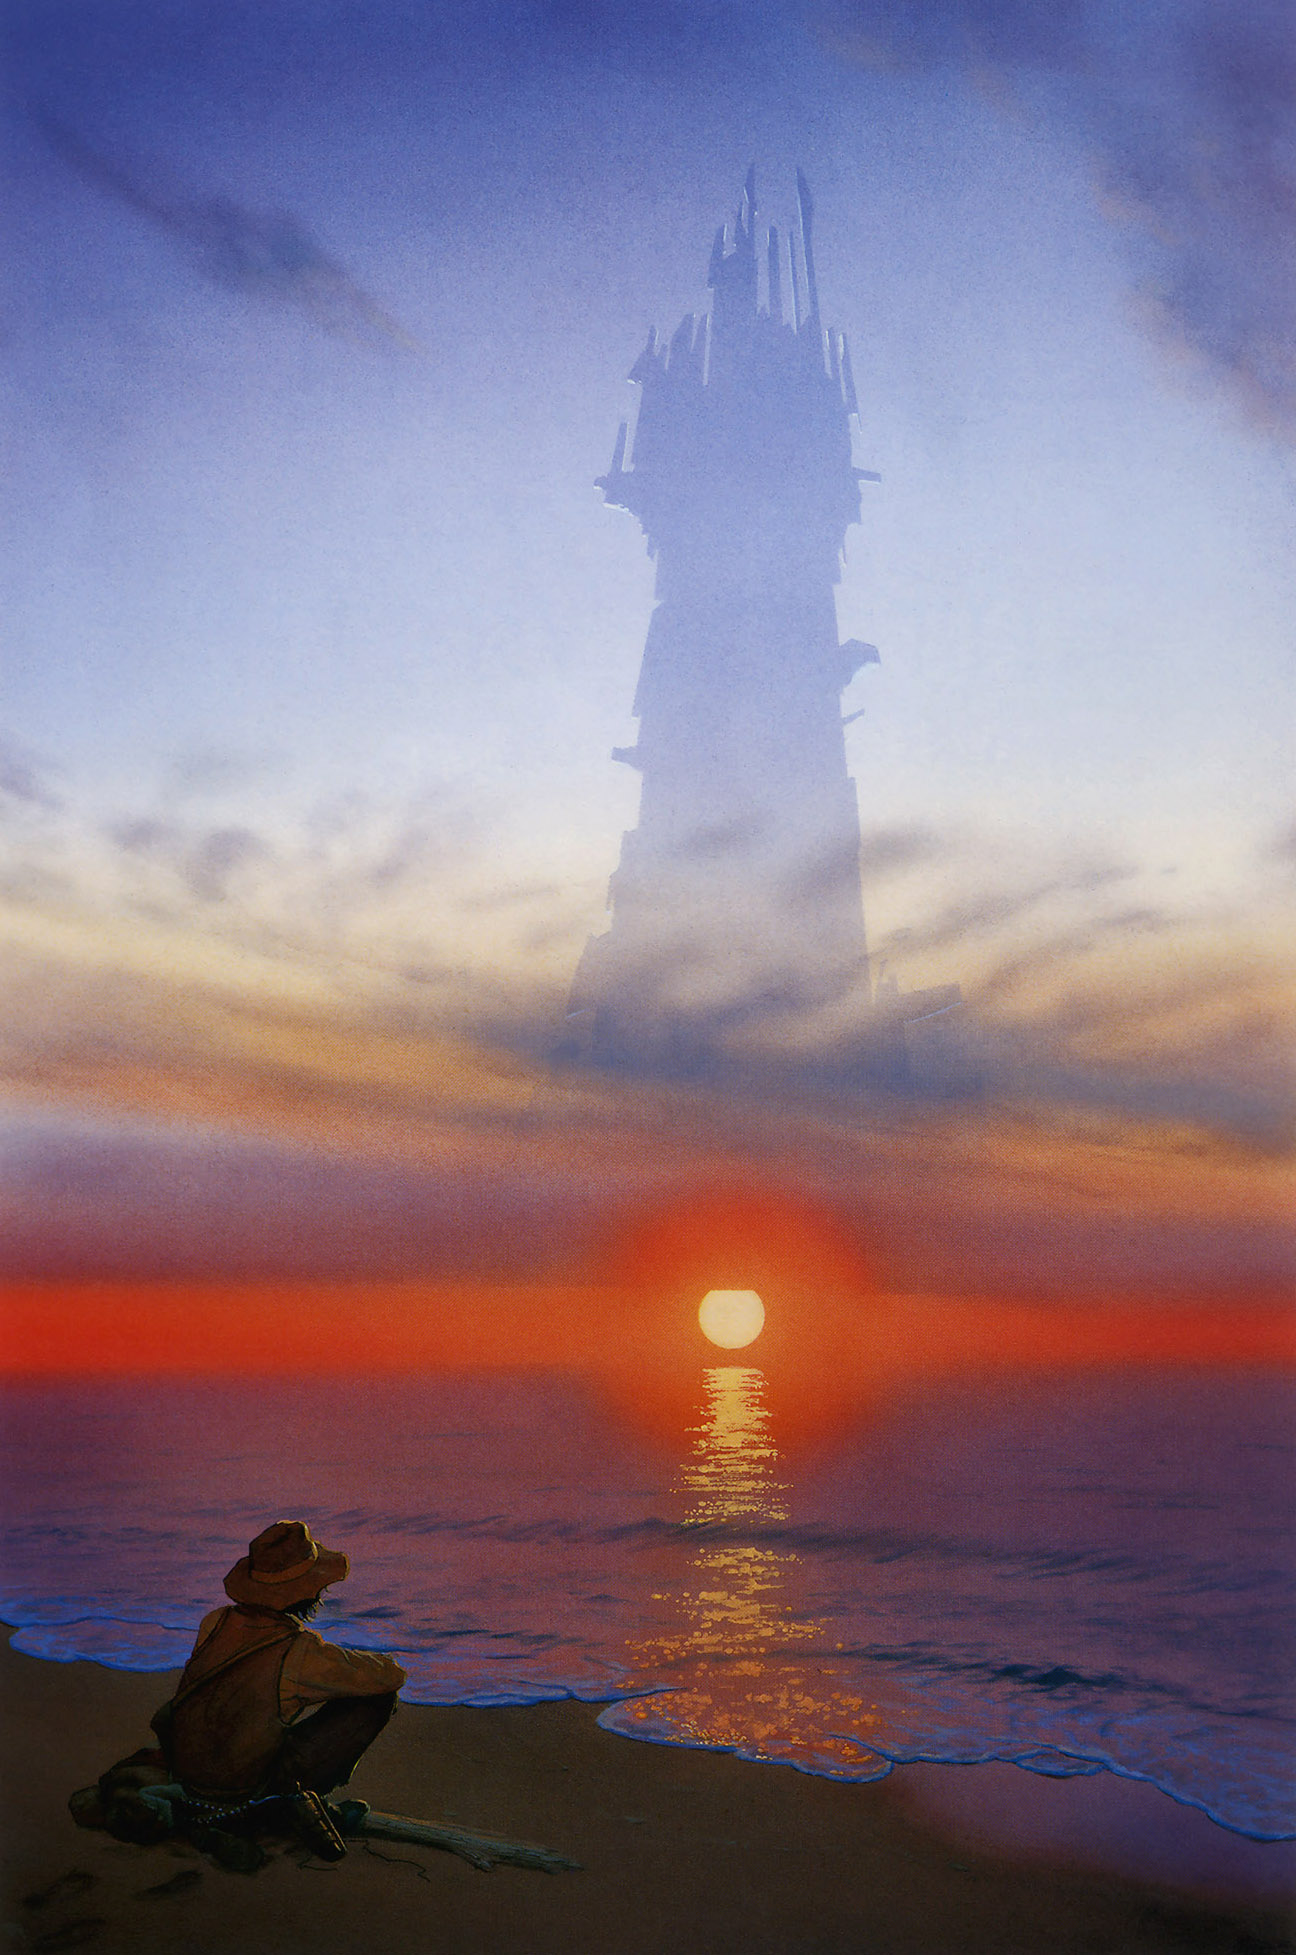 michael-whelan-the-dark-tower.jpg